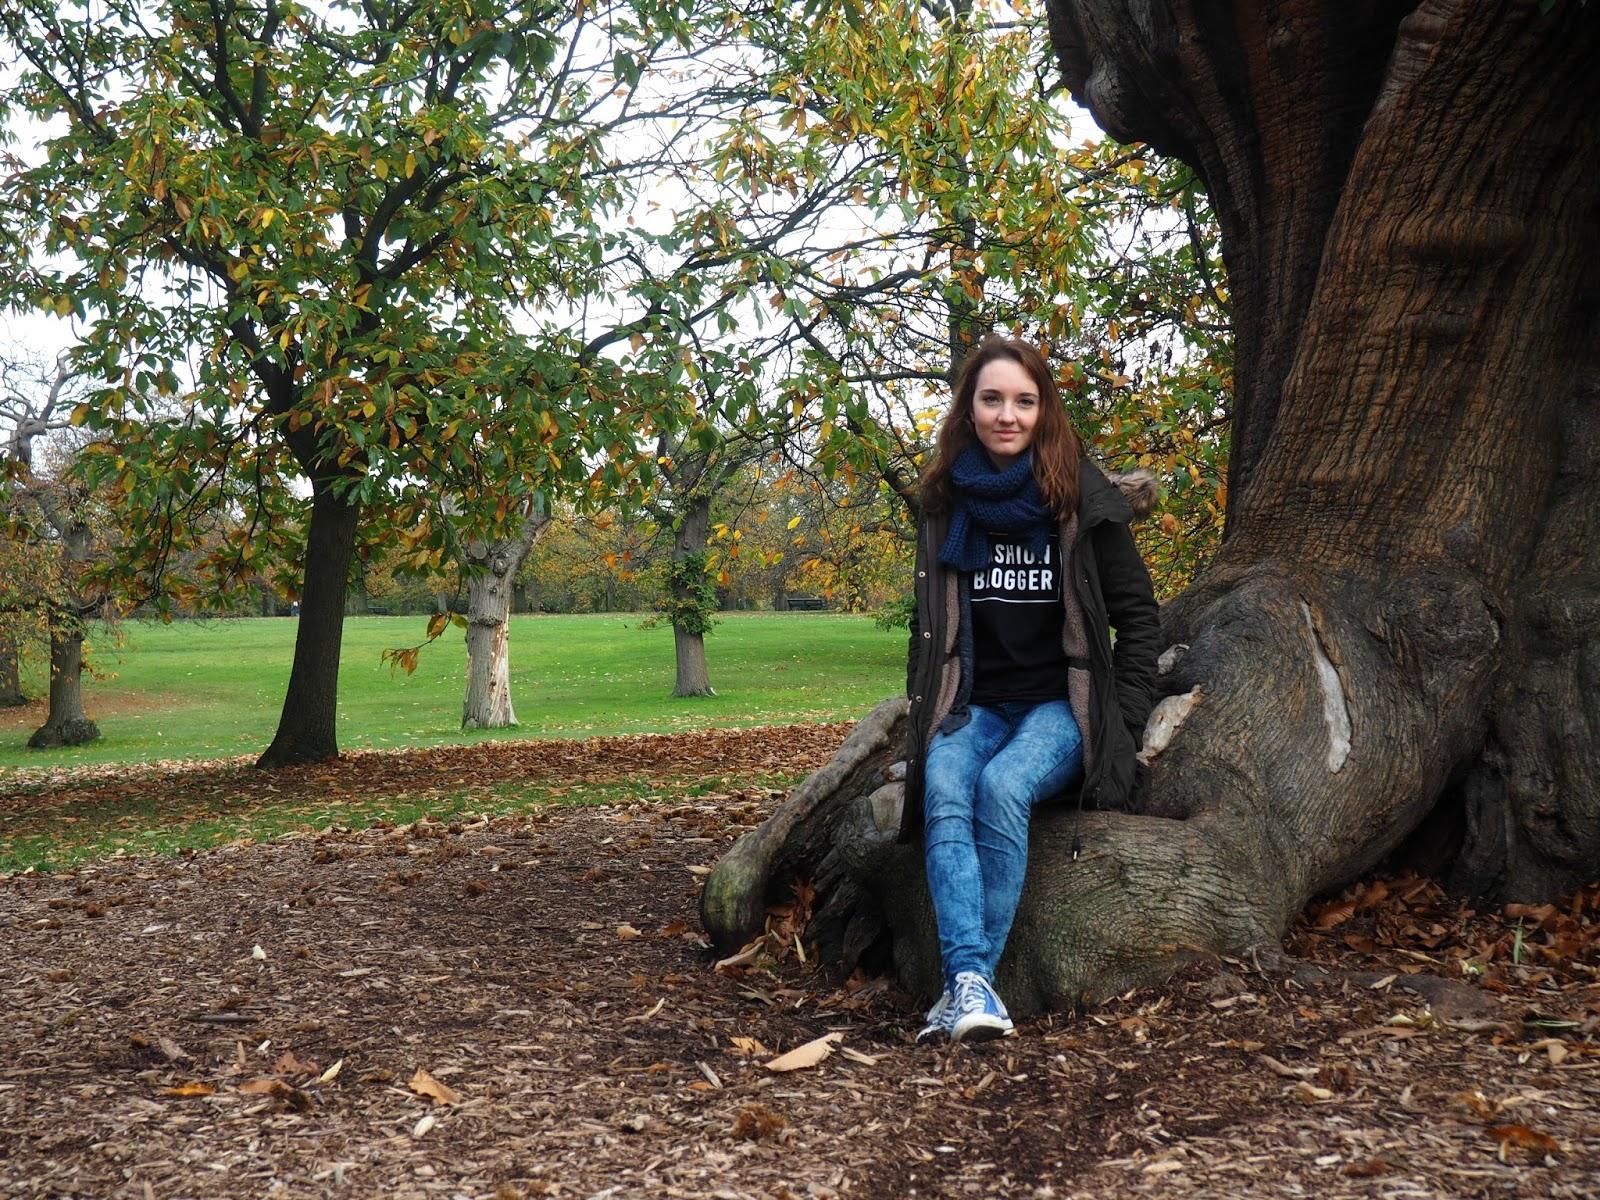 Greeenwichský park